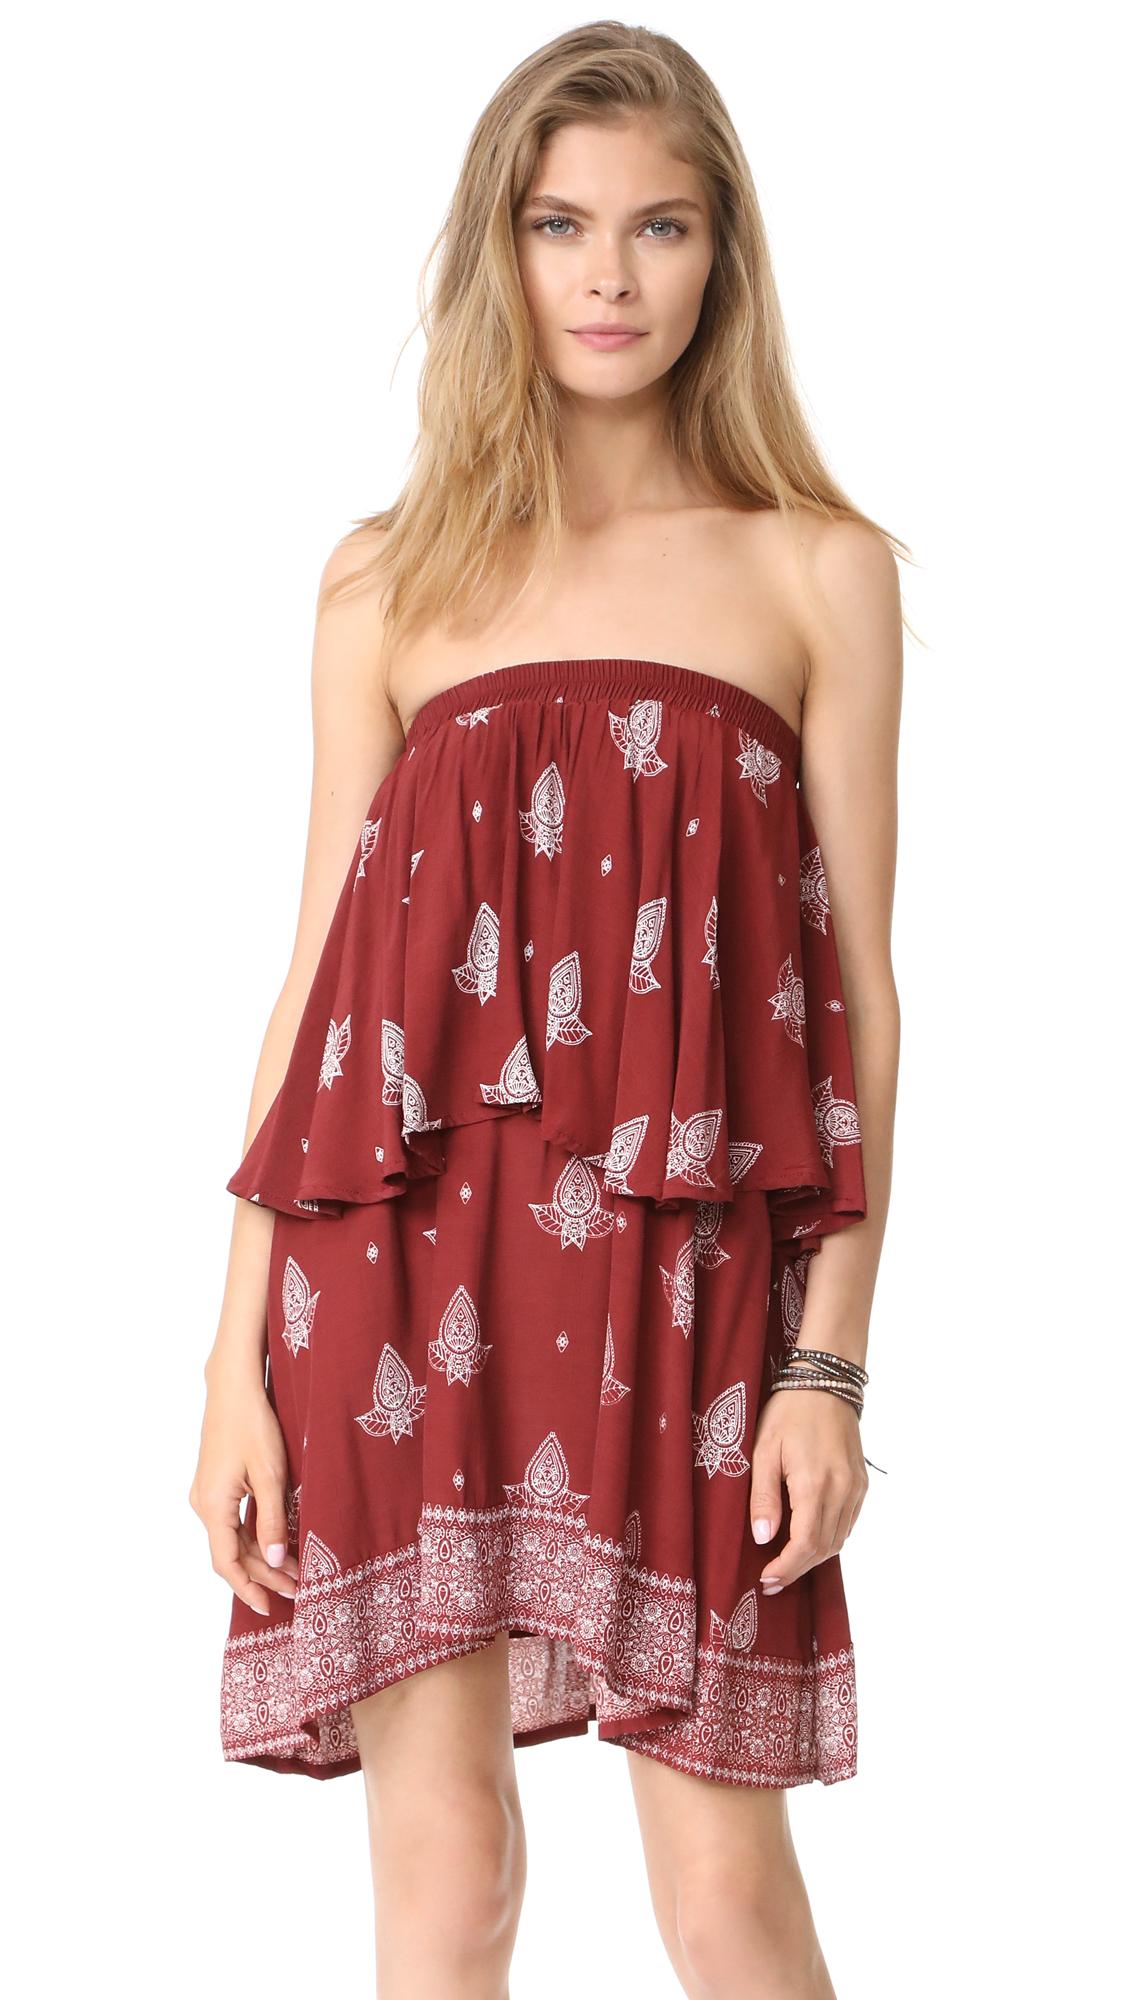 FAITHFULL THE BRAND Romy Dress - La Loma Print- Amber